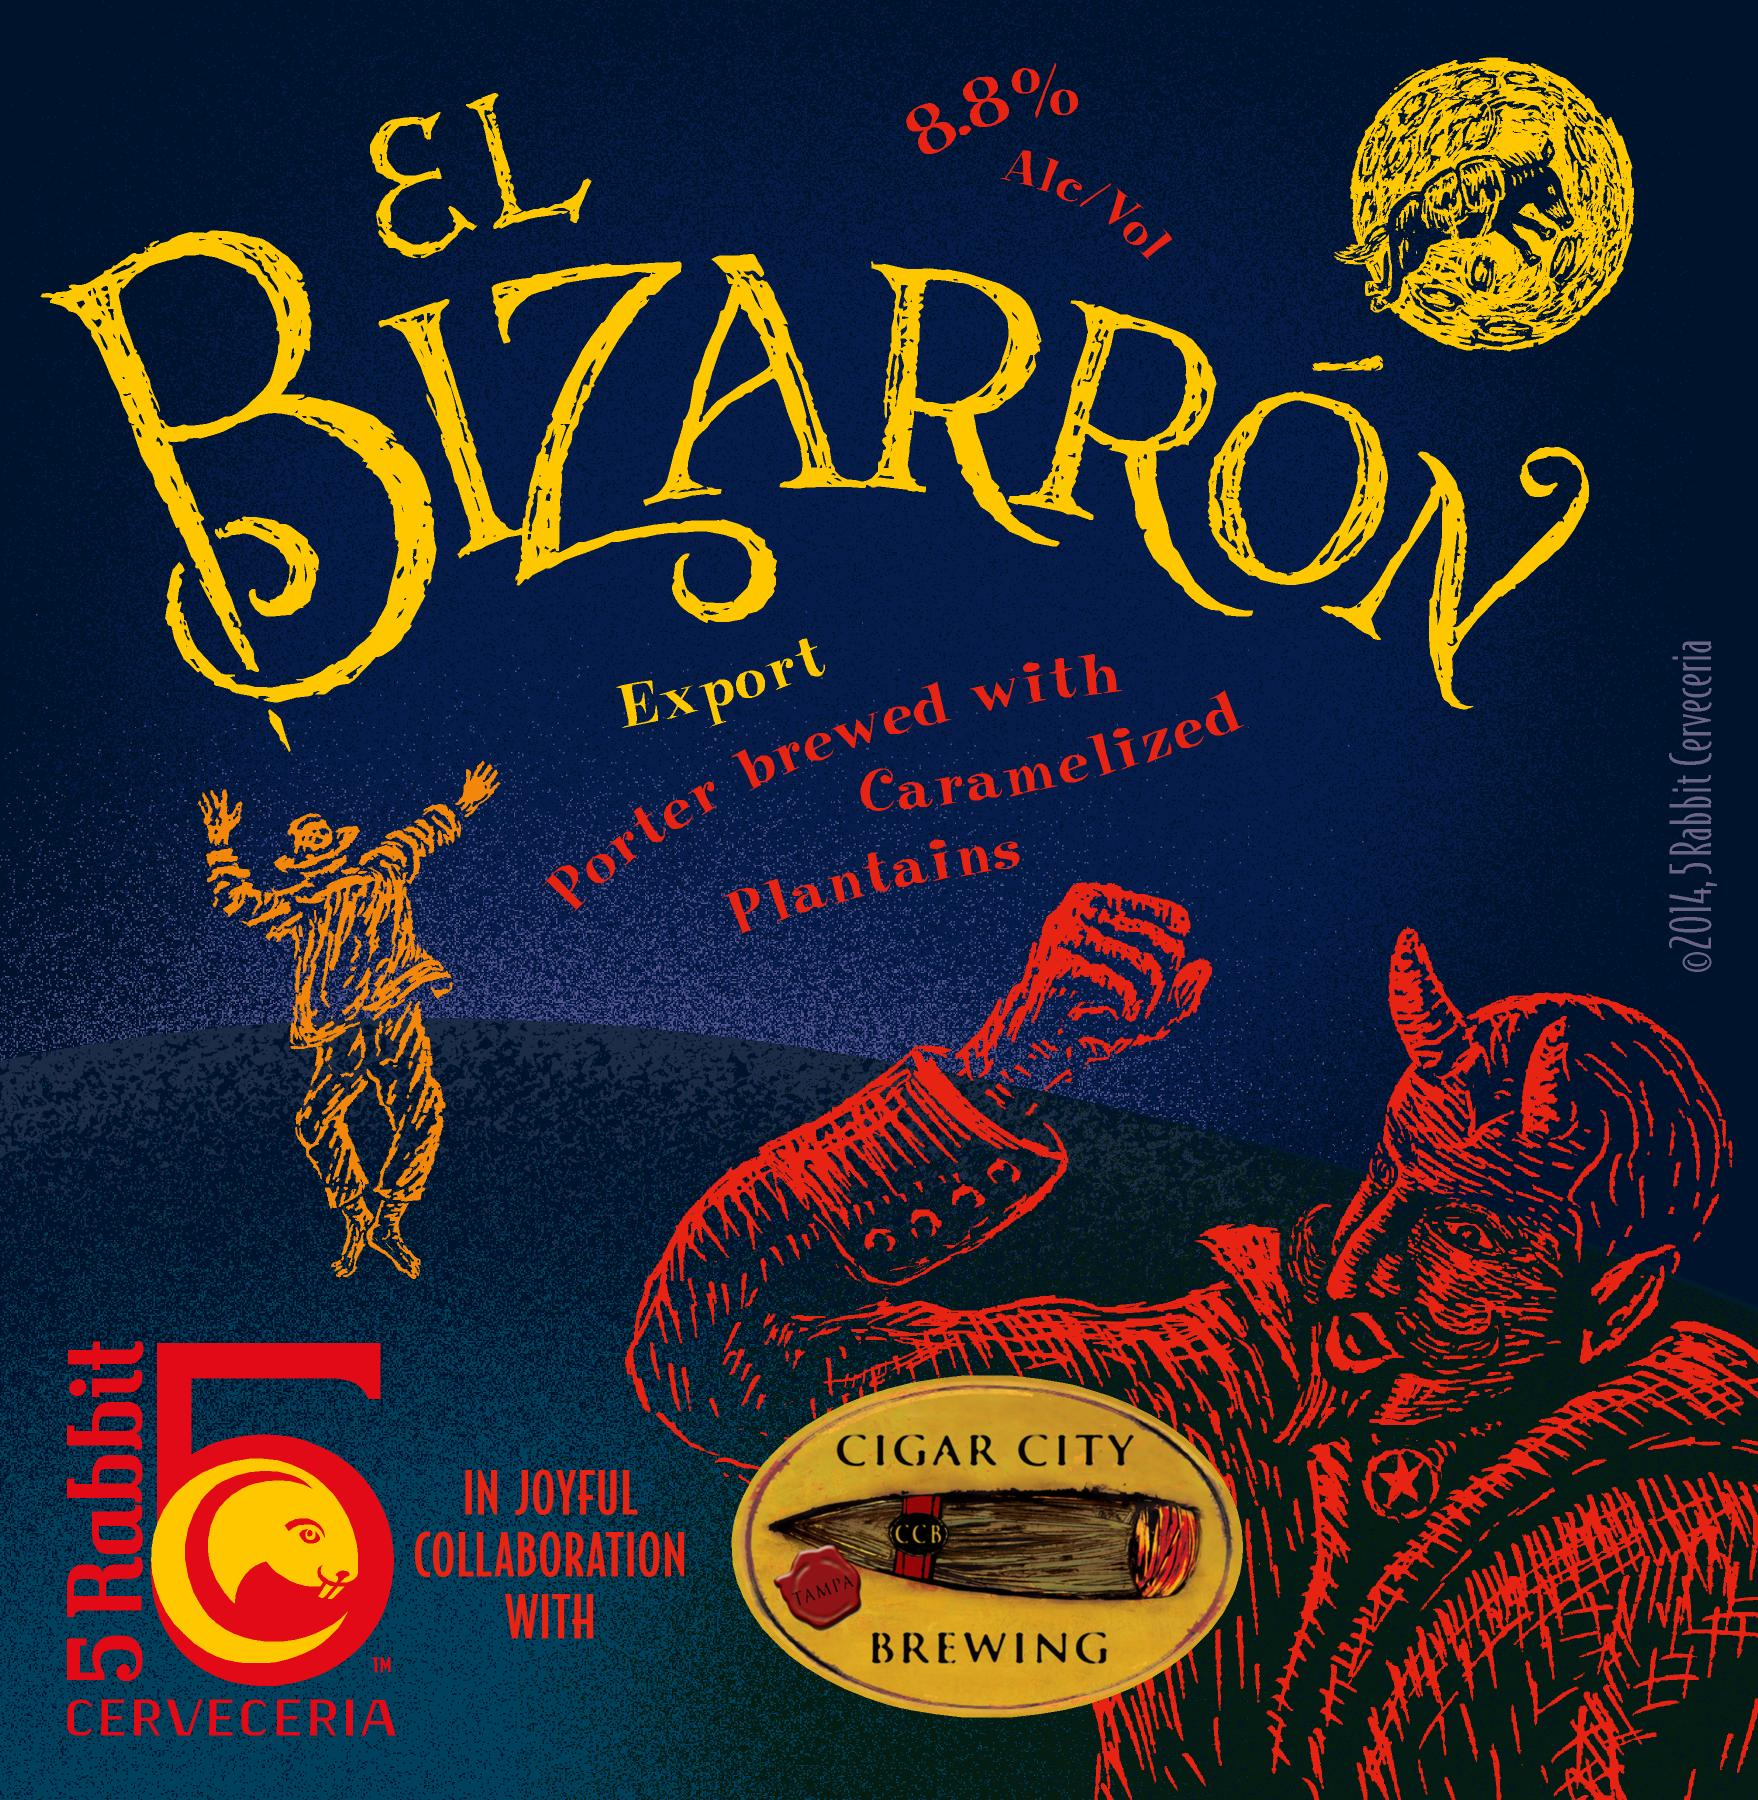 ElBizarron Lablm 1.6.jpg